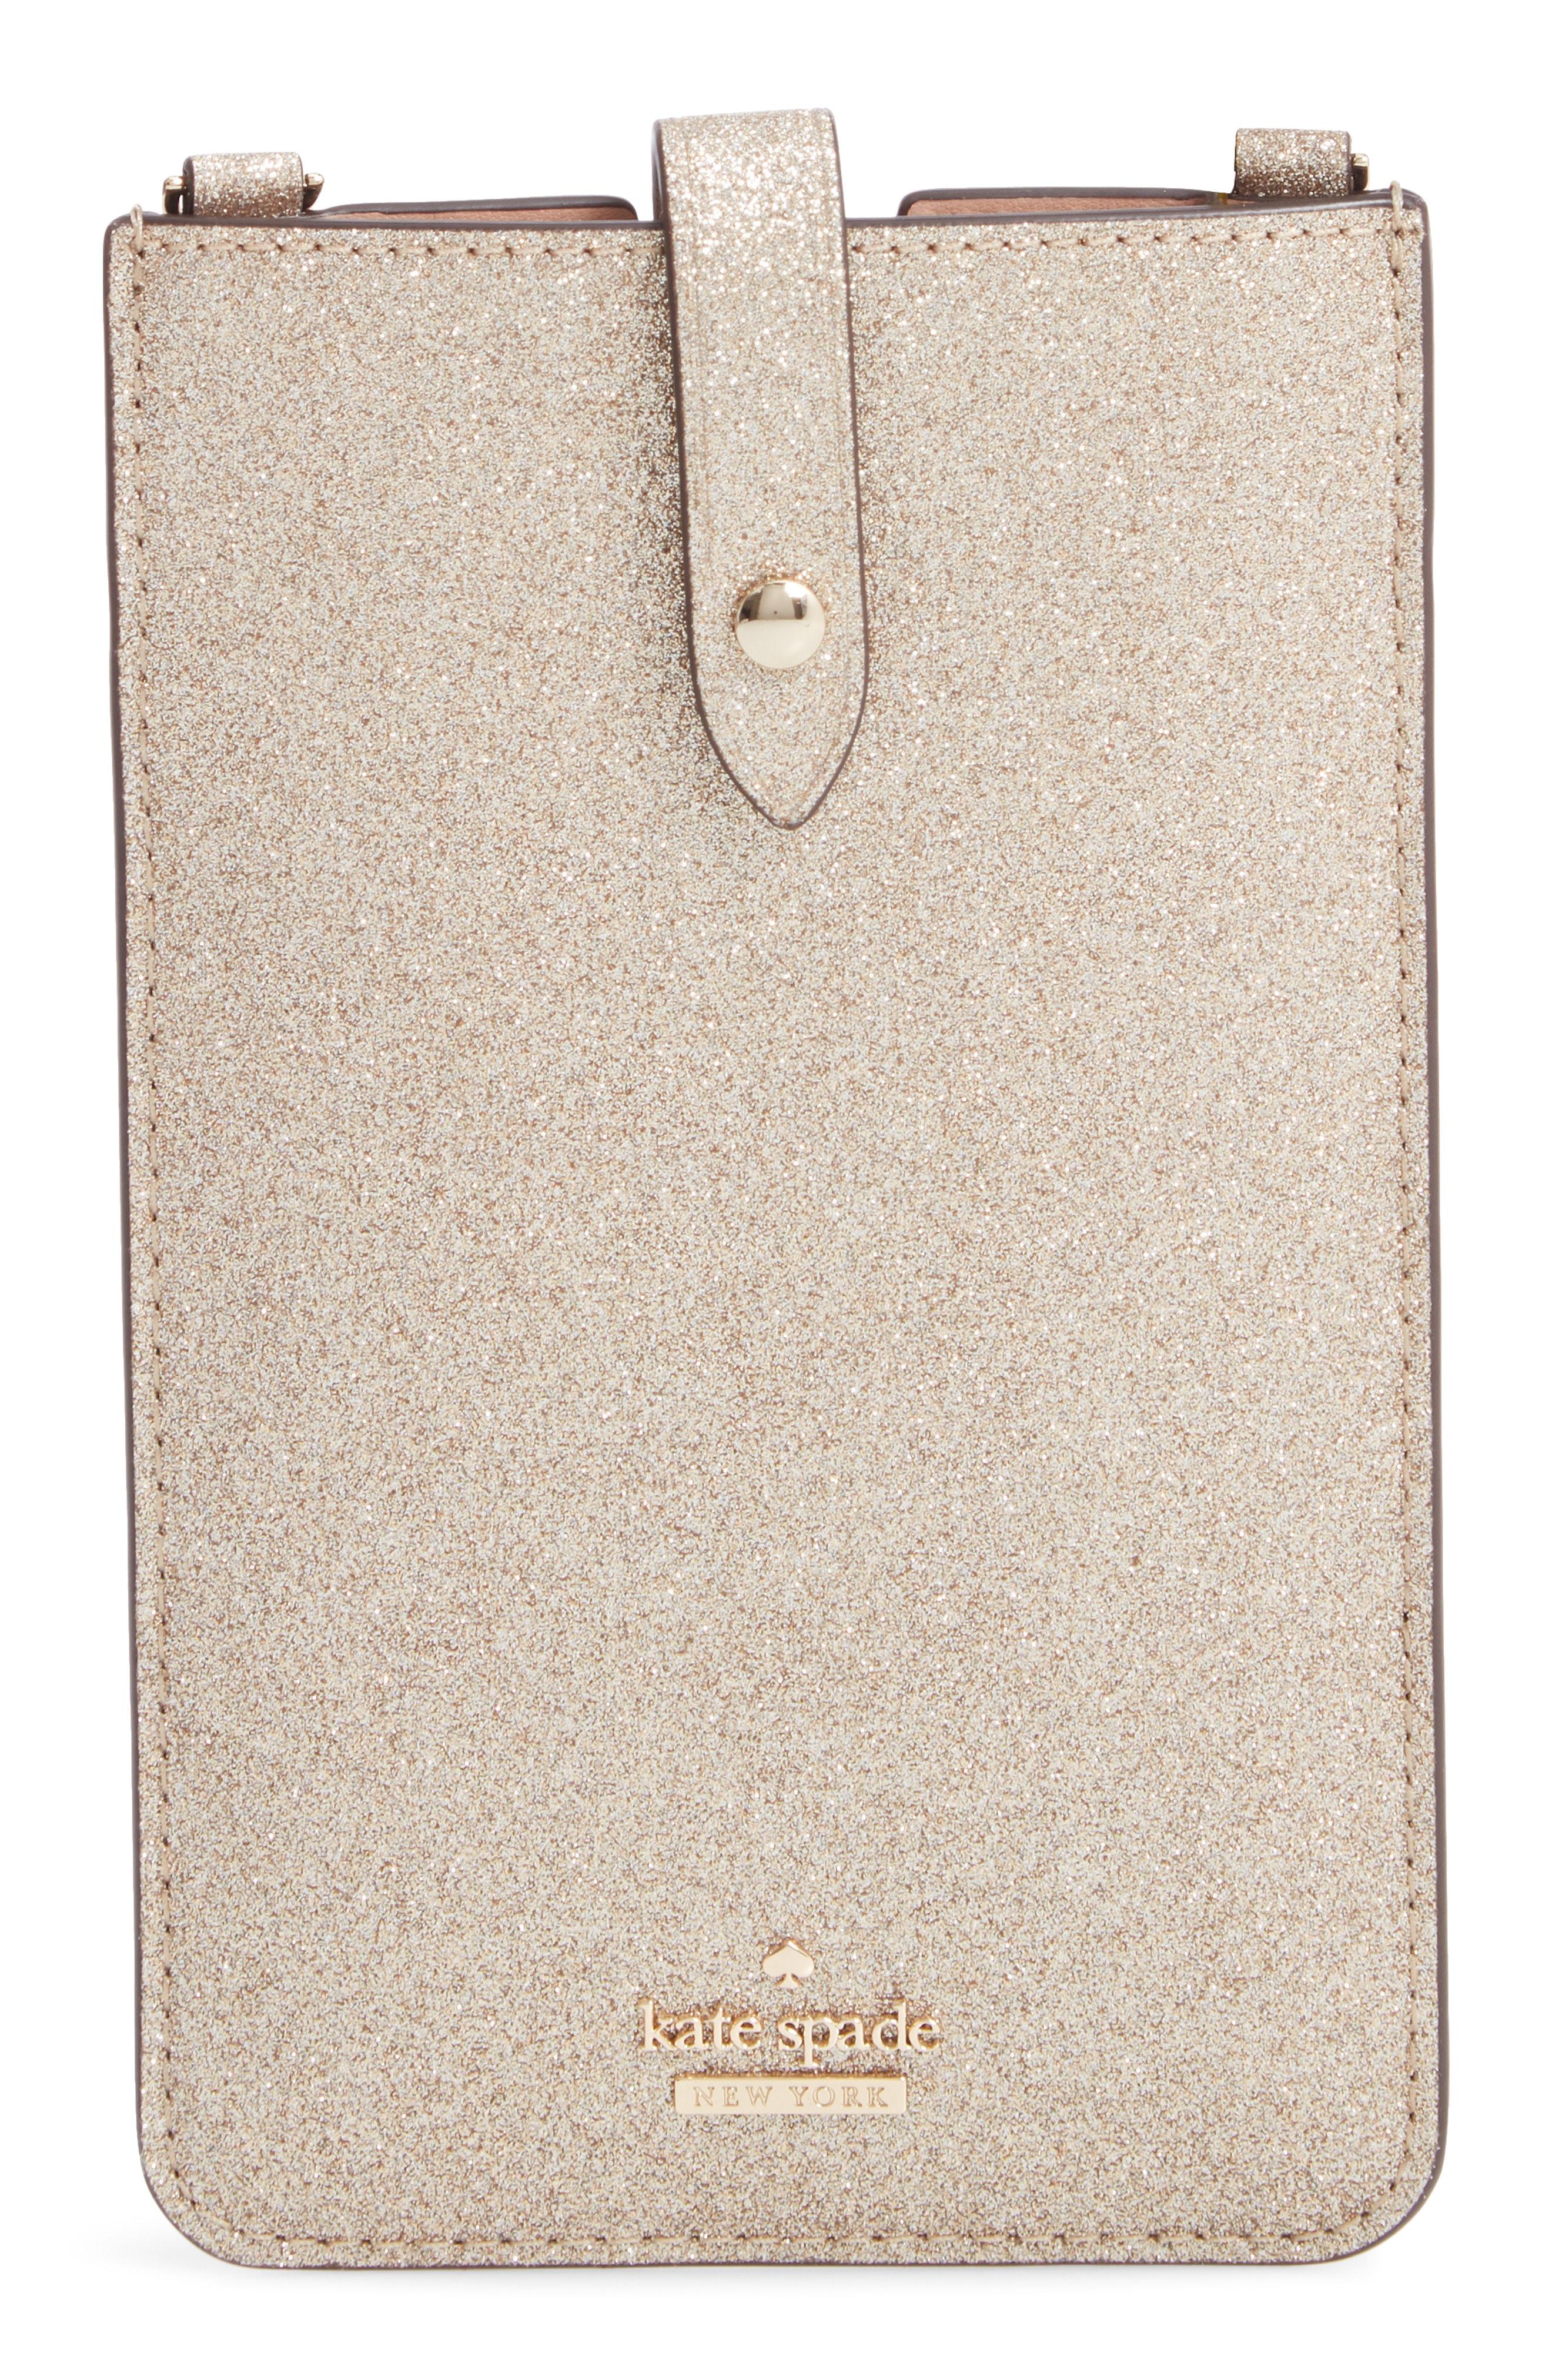 kate spade new york glitter leather iPhone crossbody case